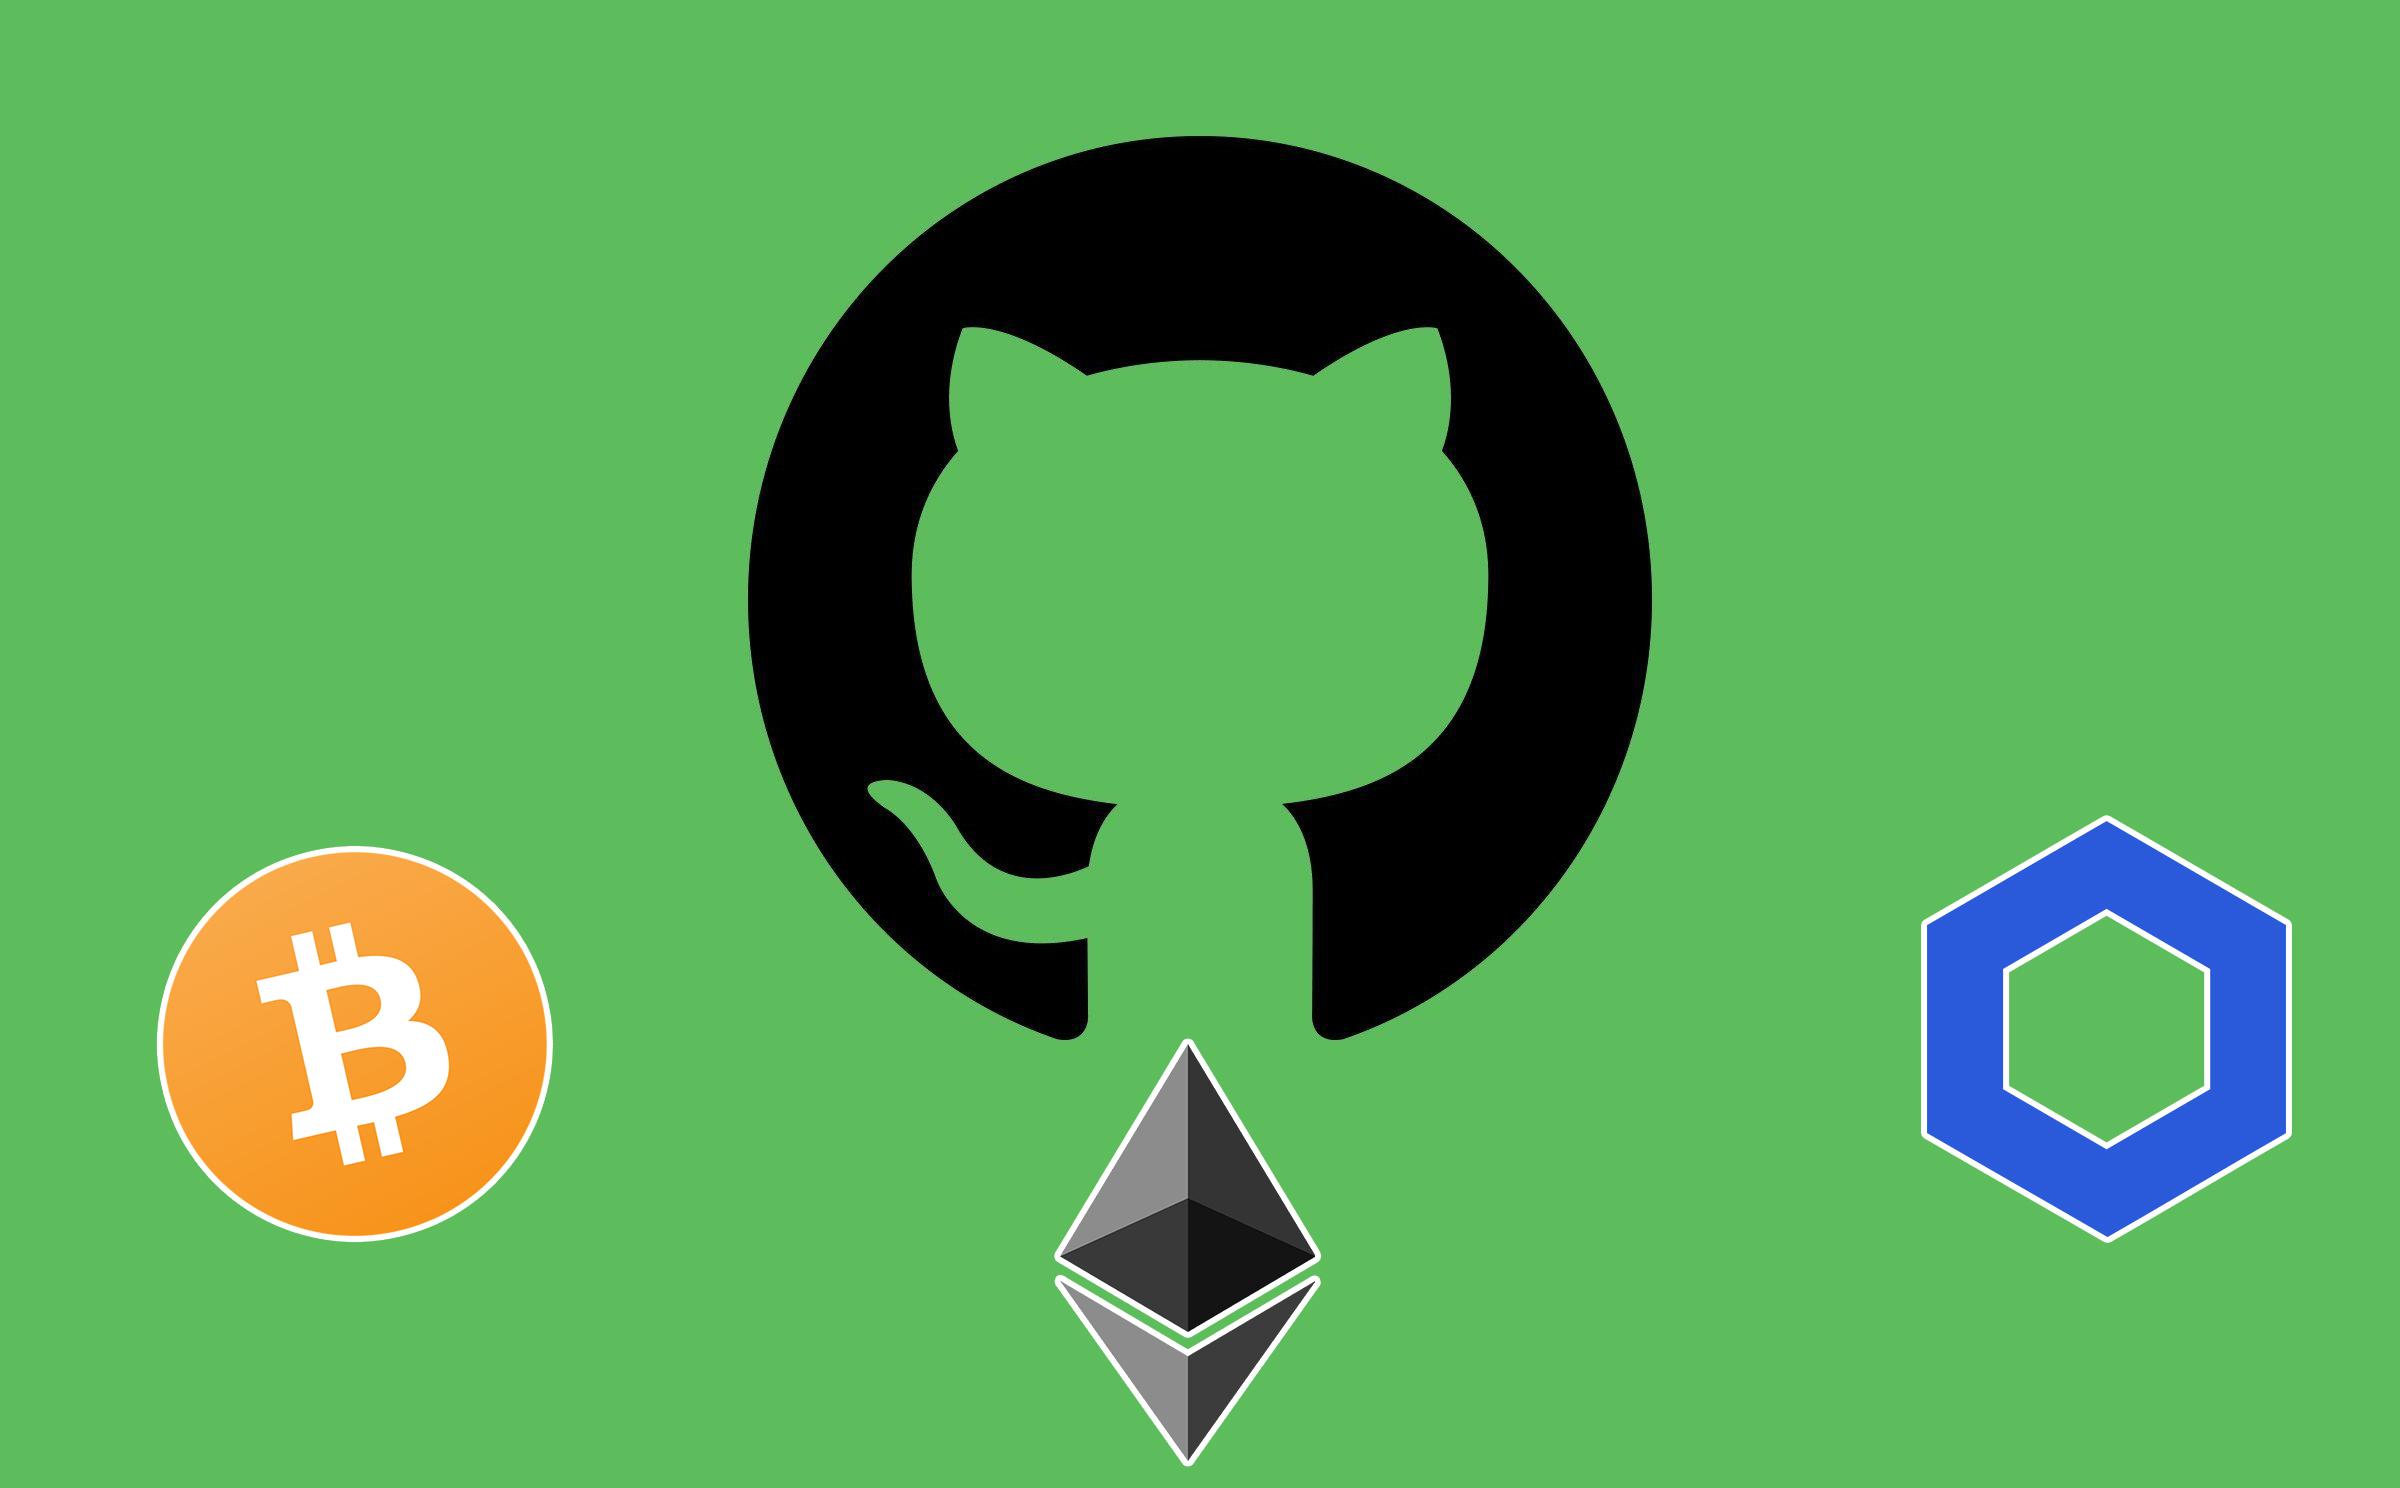 bitcoin chainlink ethereum github